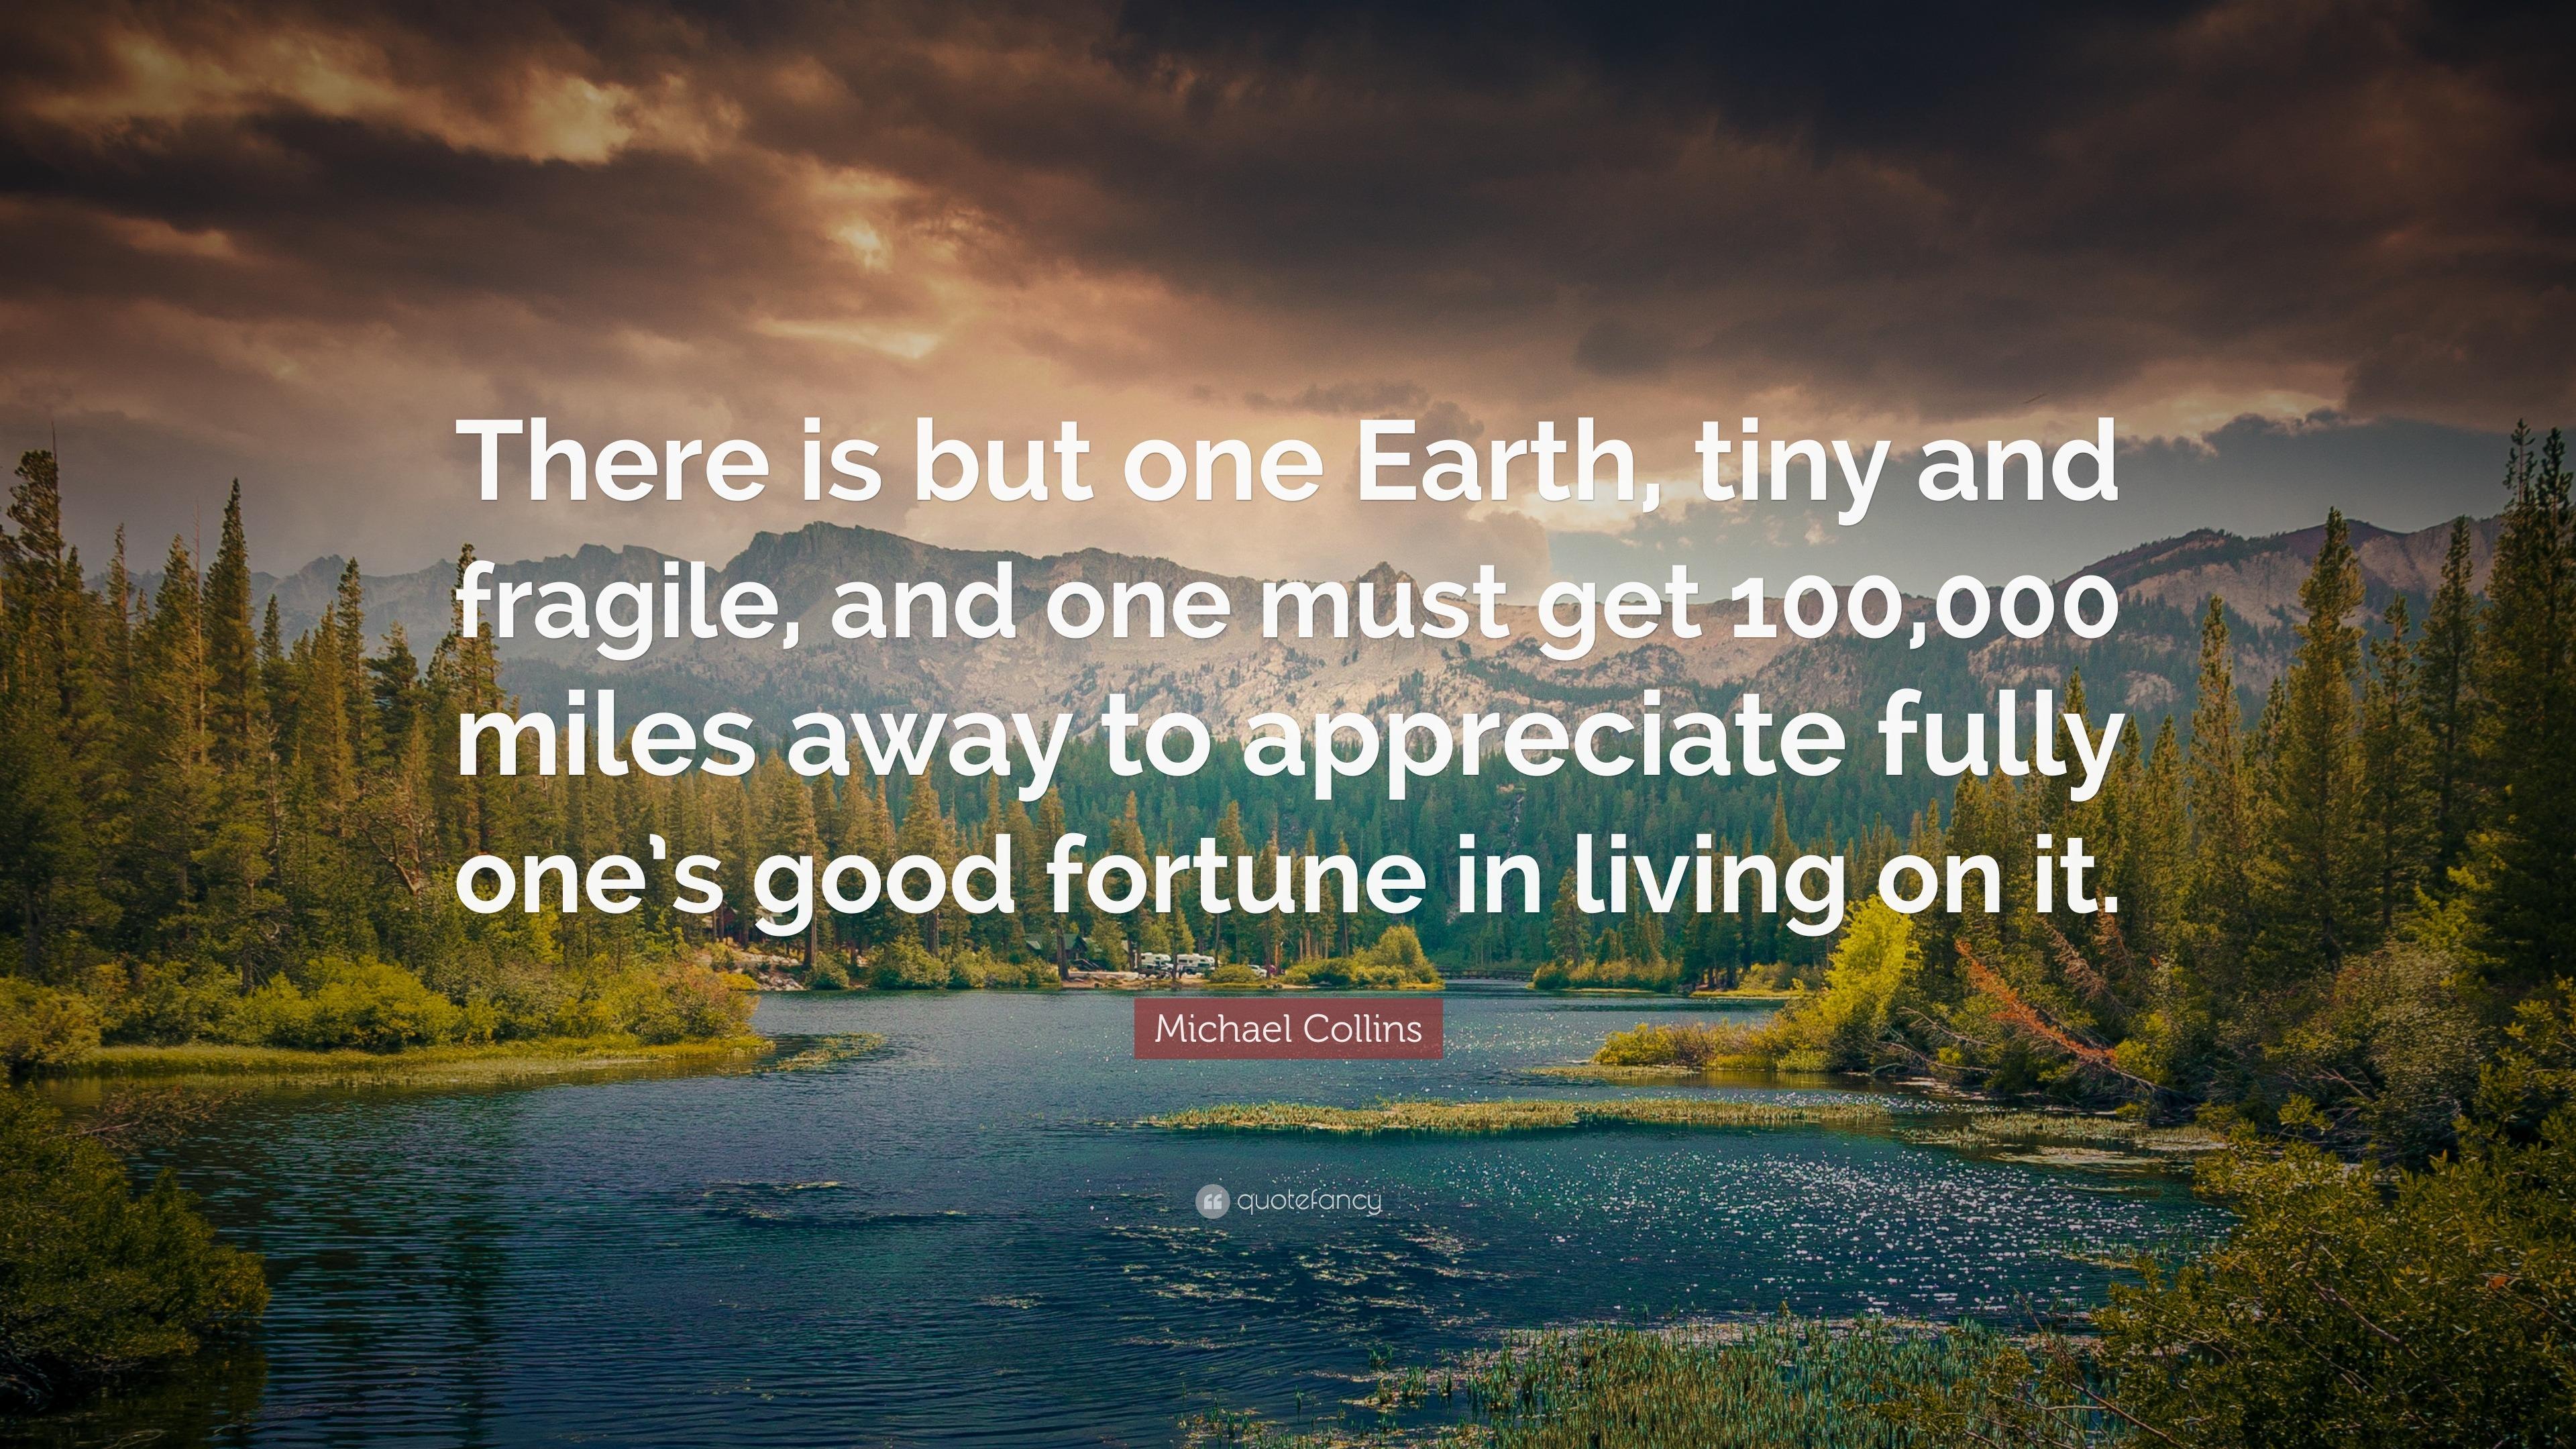 Michael Collins Quotes